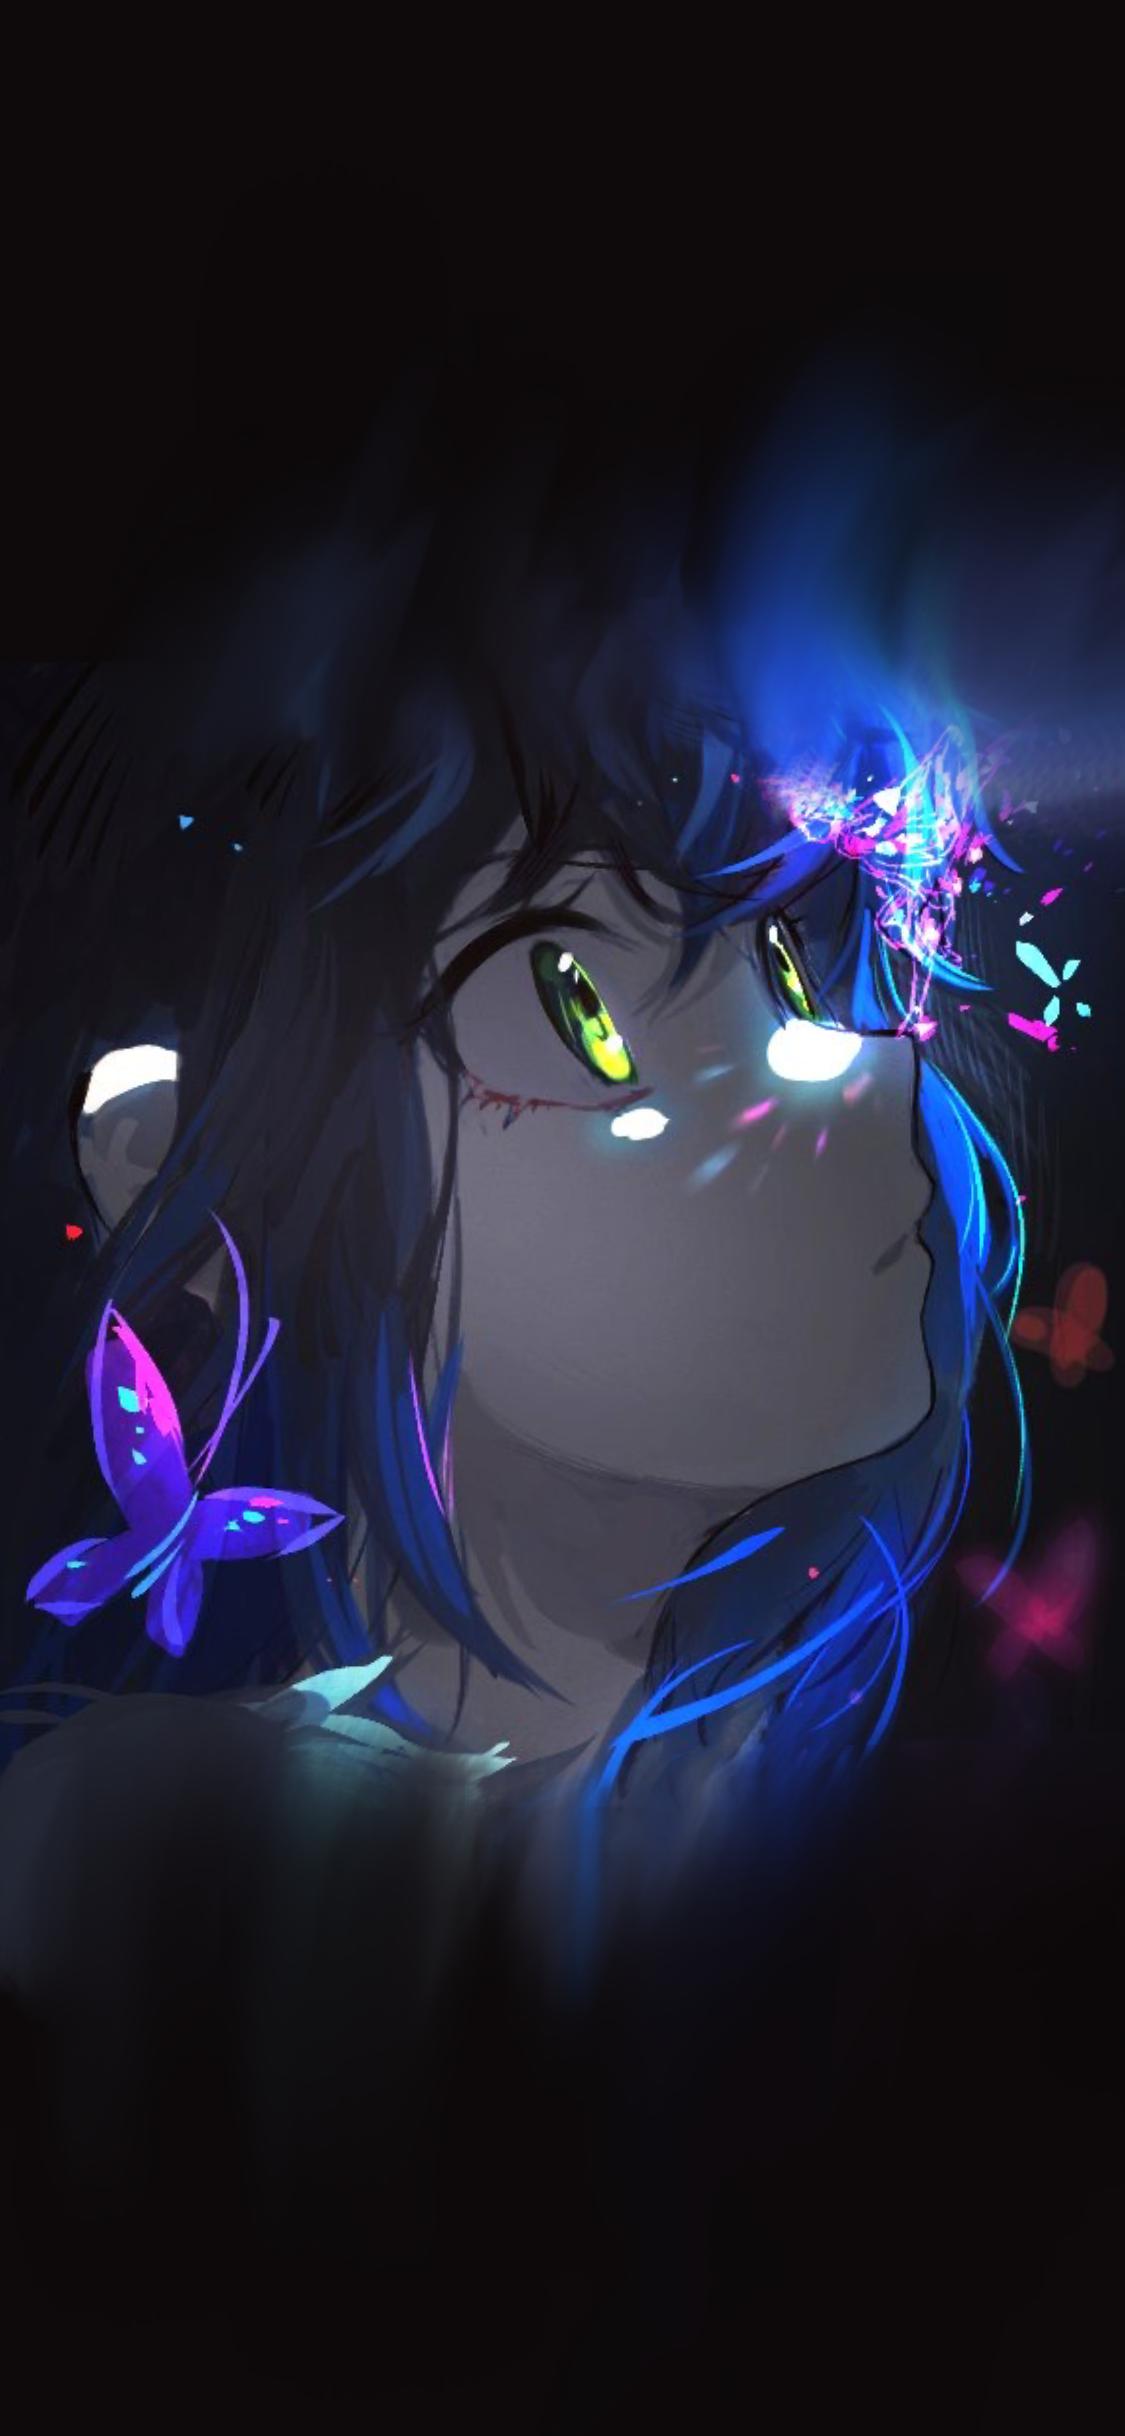 Kimetsu No Yaiba Wallpaper Anime Anime Wallpaper Dark Wallpaper